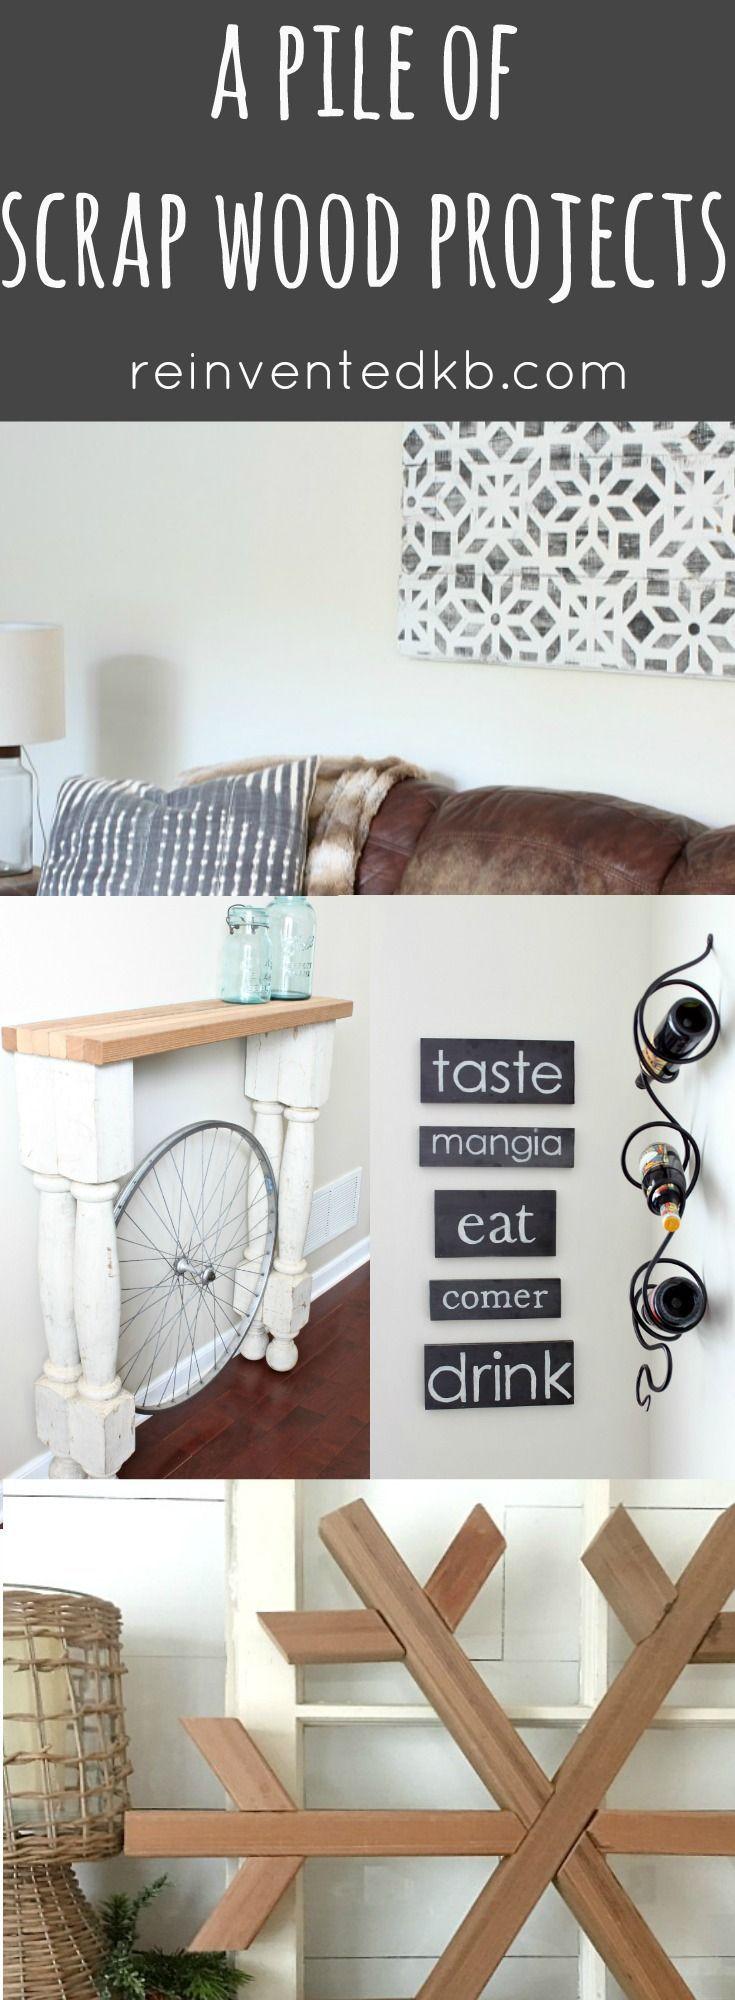 Kleines badezimmer dekor diy  best farmhouse dream house images on pinterest  bathroom